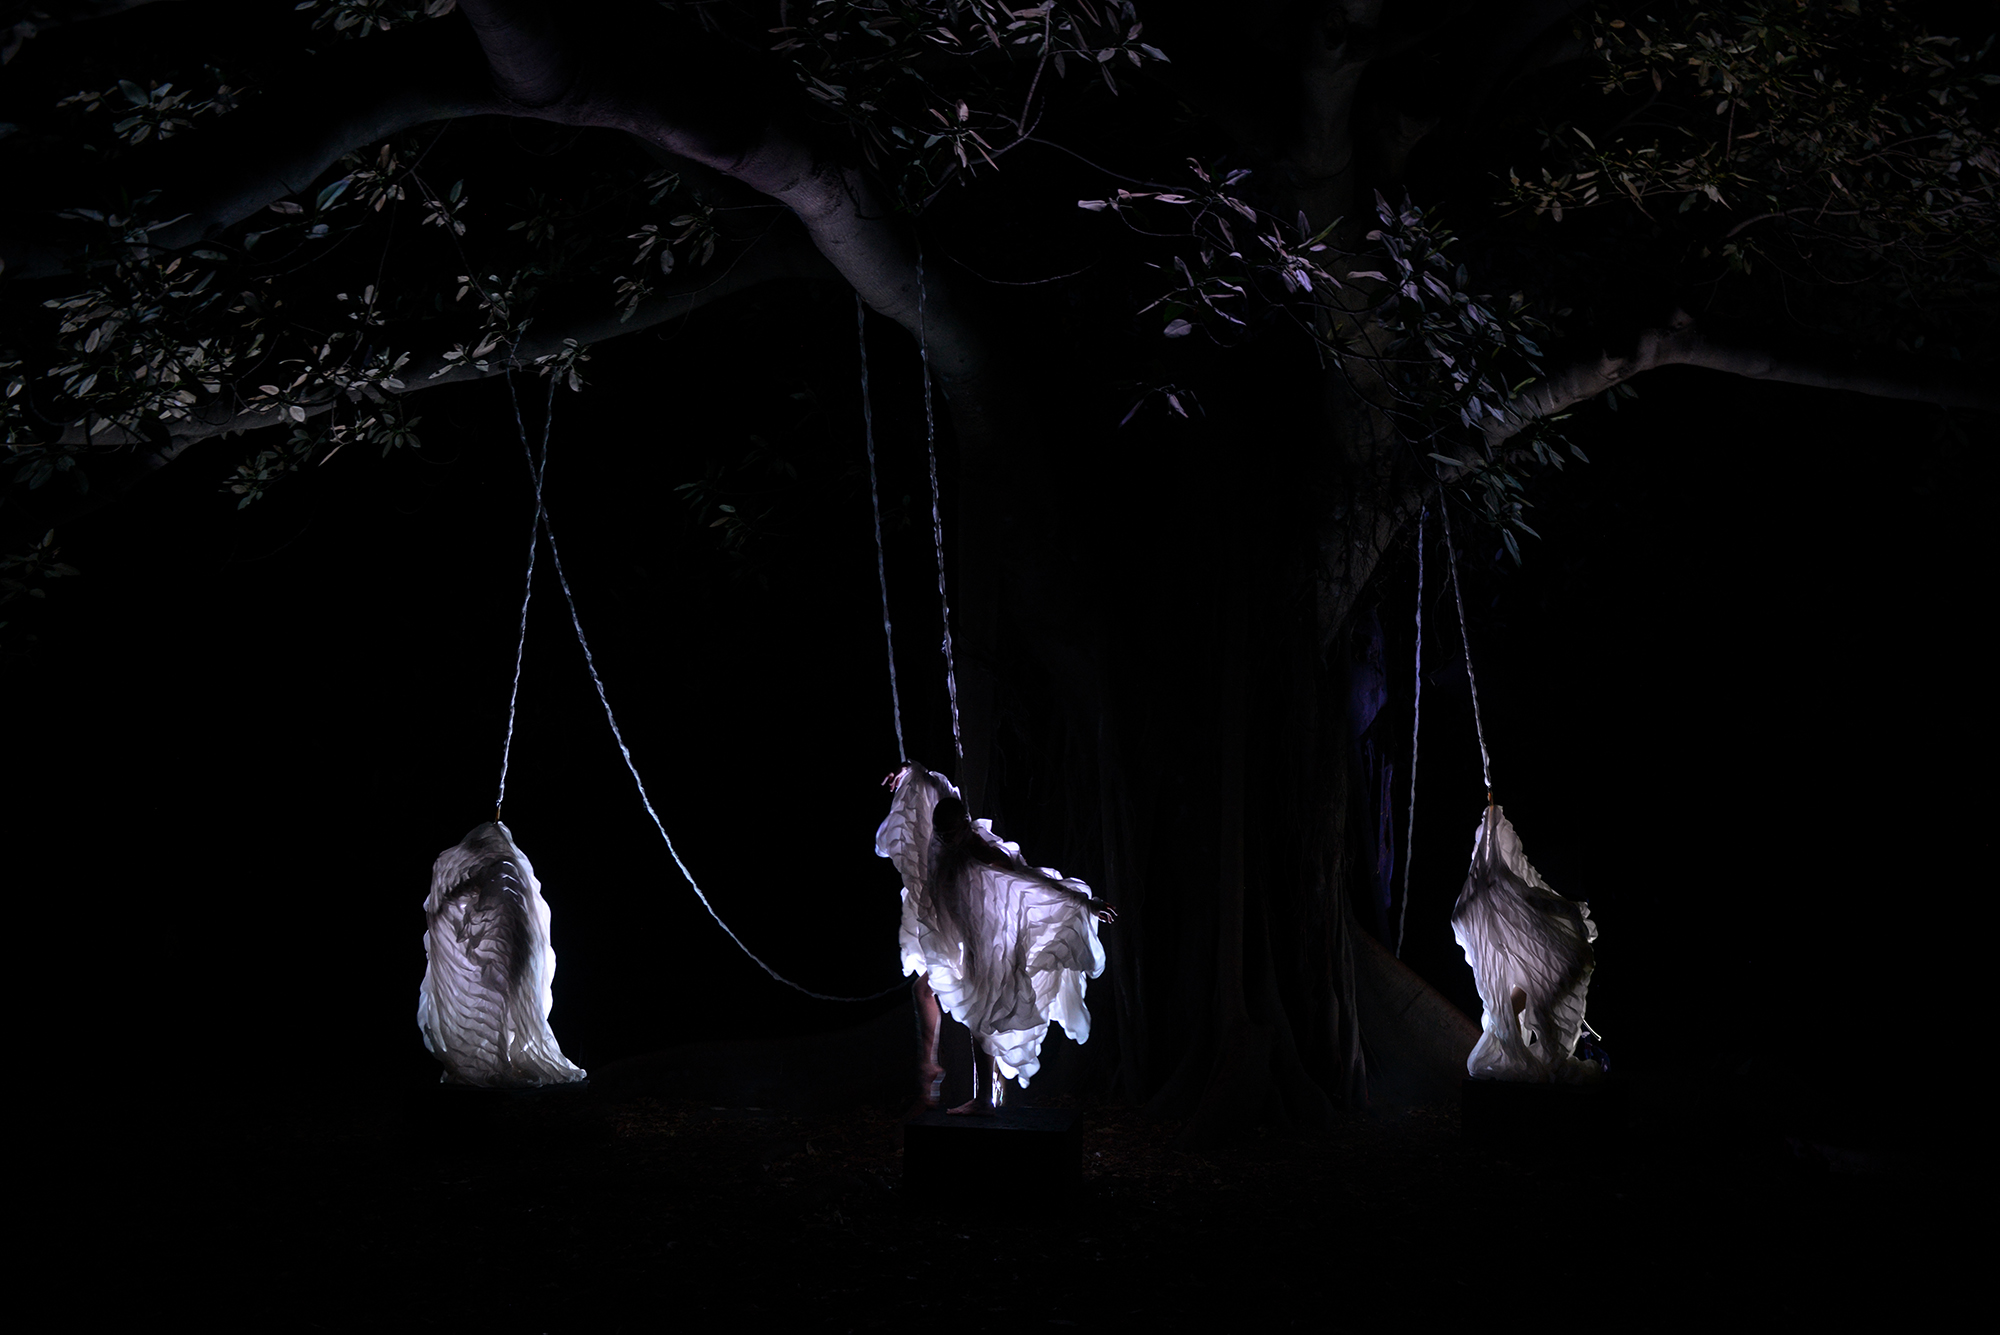 performer collaborators : Holly Durant, Samuel Hartnett-Welk & Lily Paskas l photography : Kathy Luu